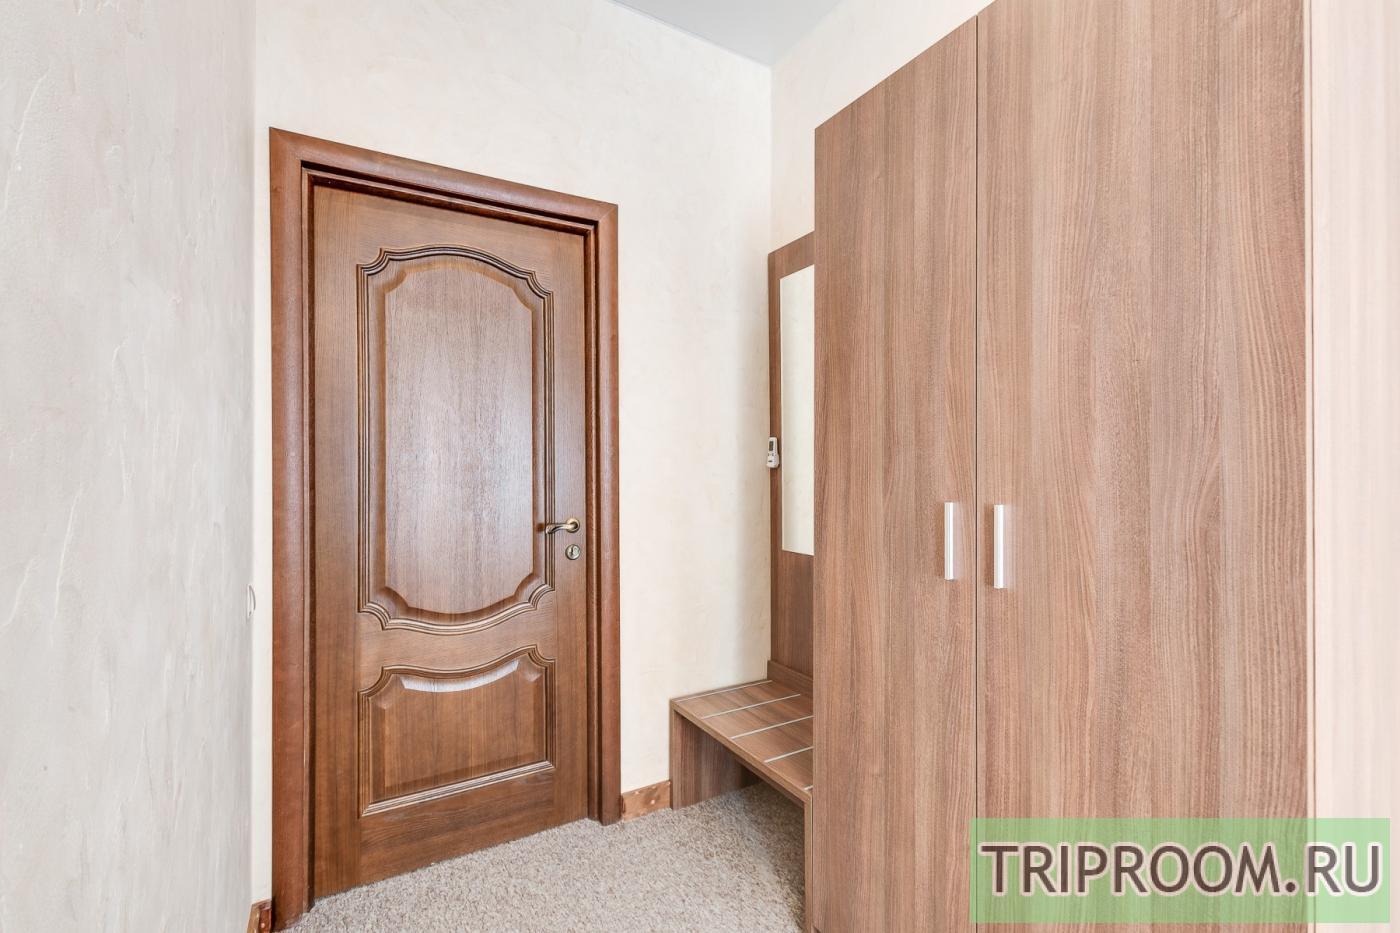 1-комнатная квартира посуточно (вариант № 20817), ул. Красноармейская 7-я улица, фото № 9